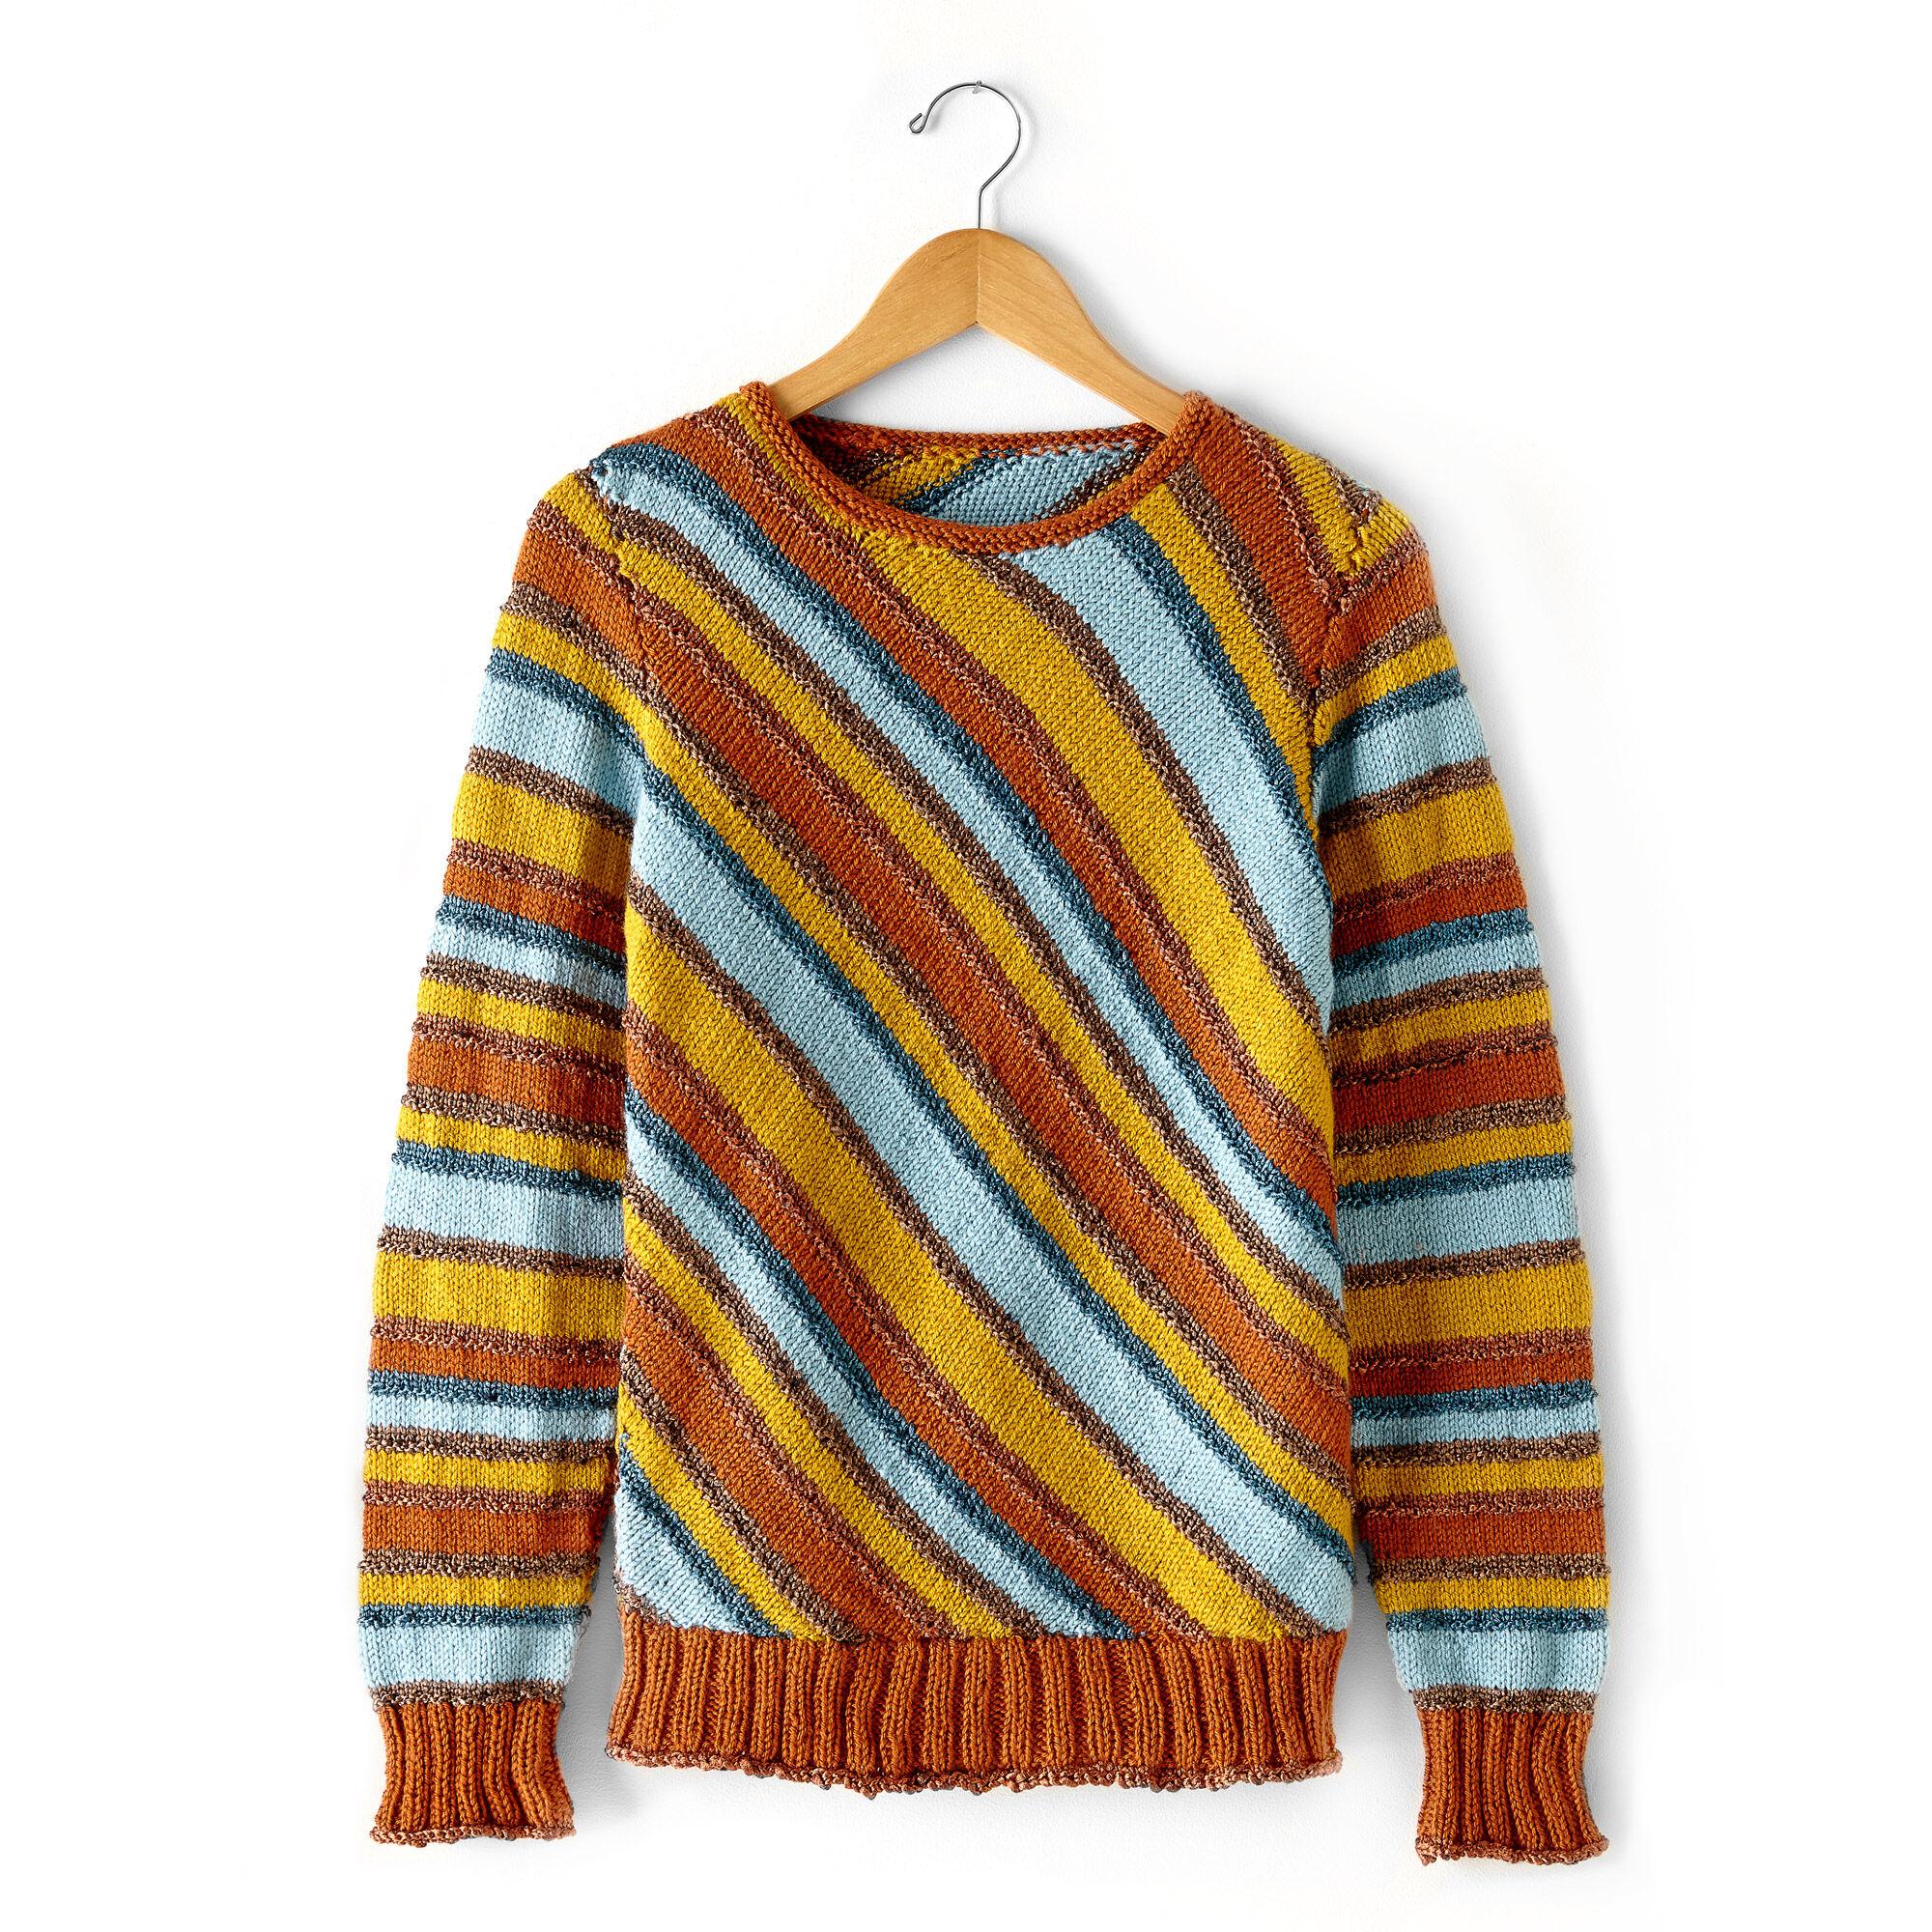 Patons Diagonal Stripes Sweater, 4XL/5XL Pattern   Yarnspirations